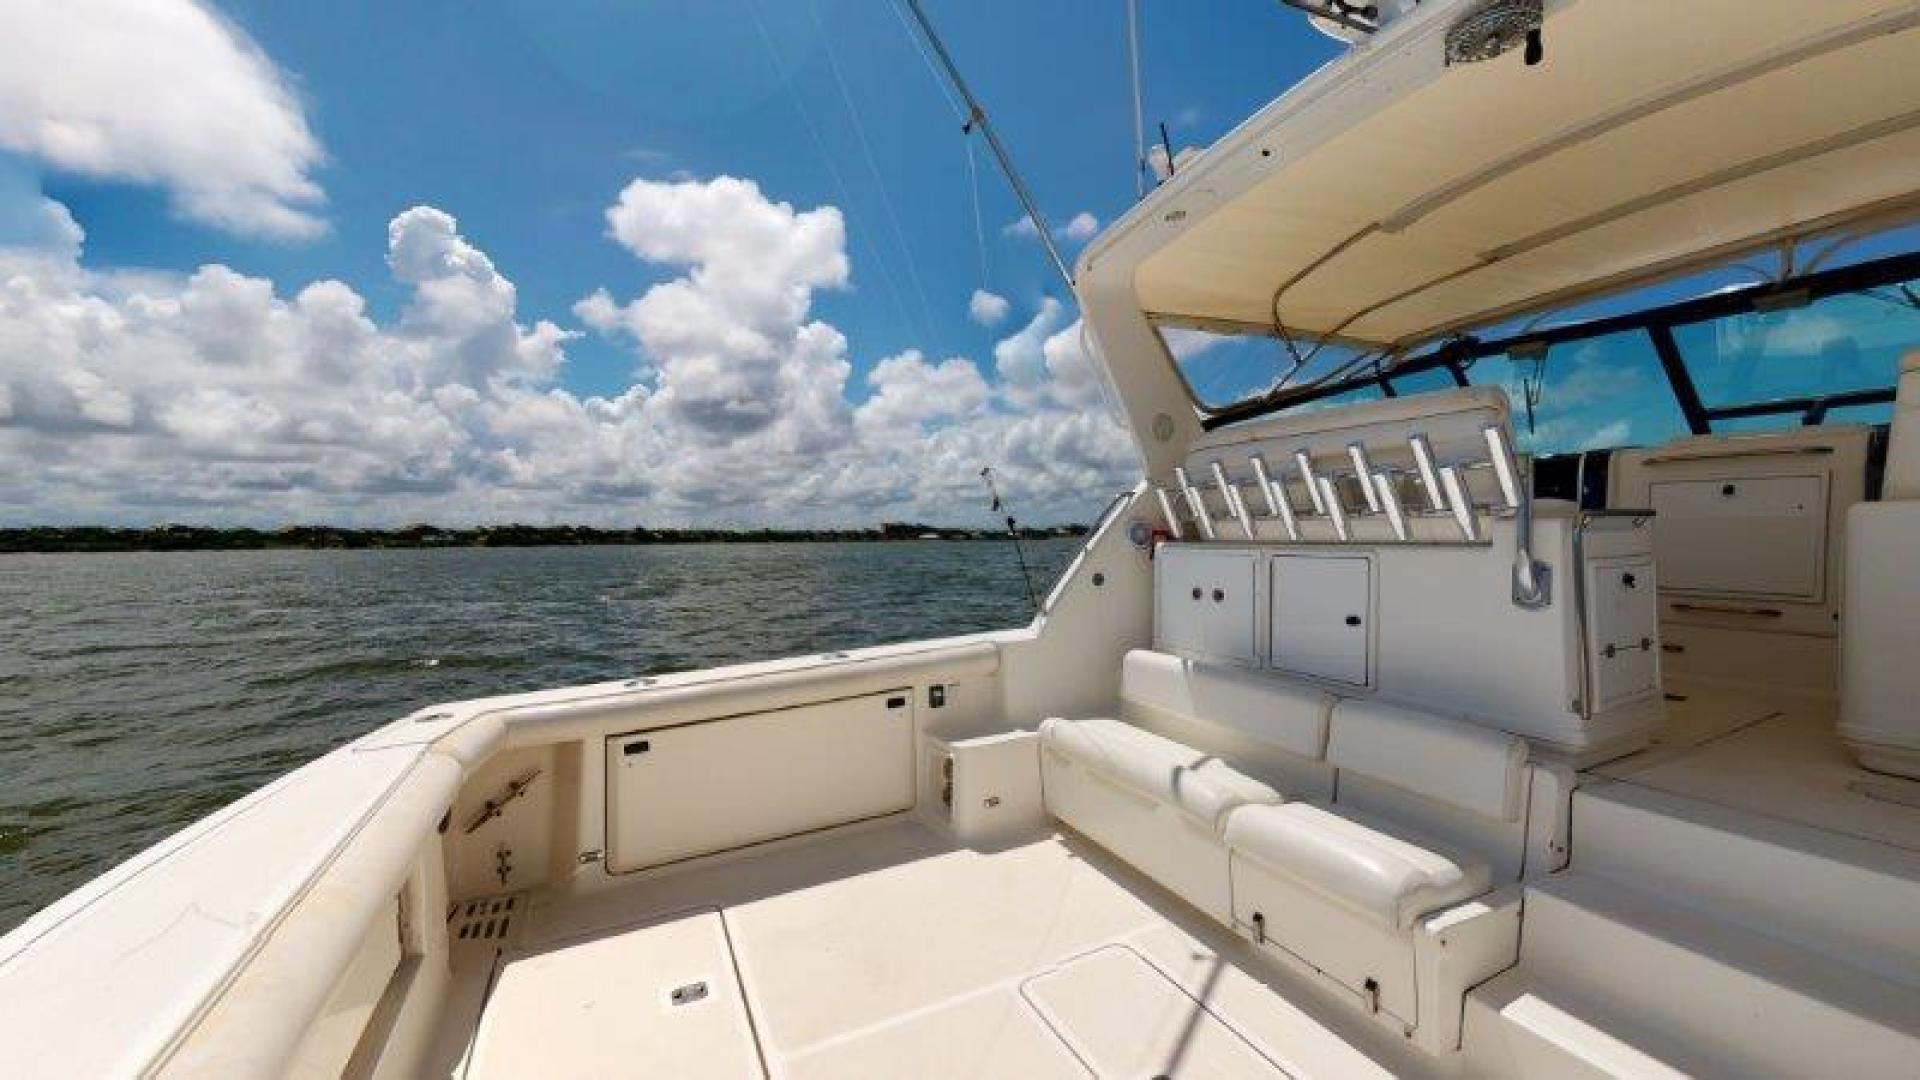 Tiara Yachts-4100 Open 2000-Sans Peur Stuart-Florida-United States-Cockpit-1464324 | Thumbnail